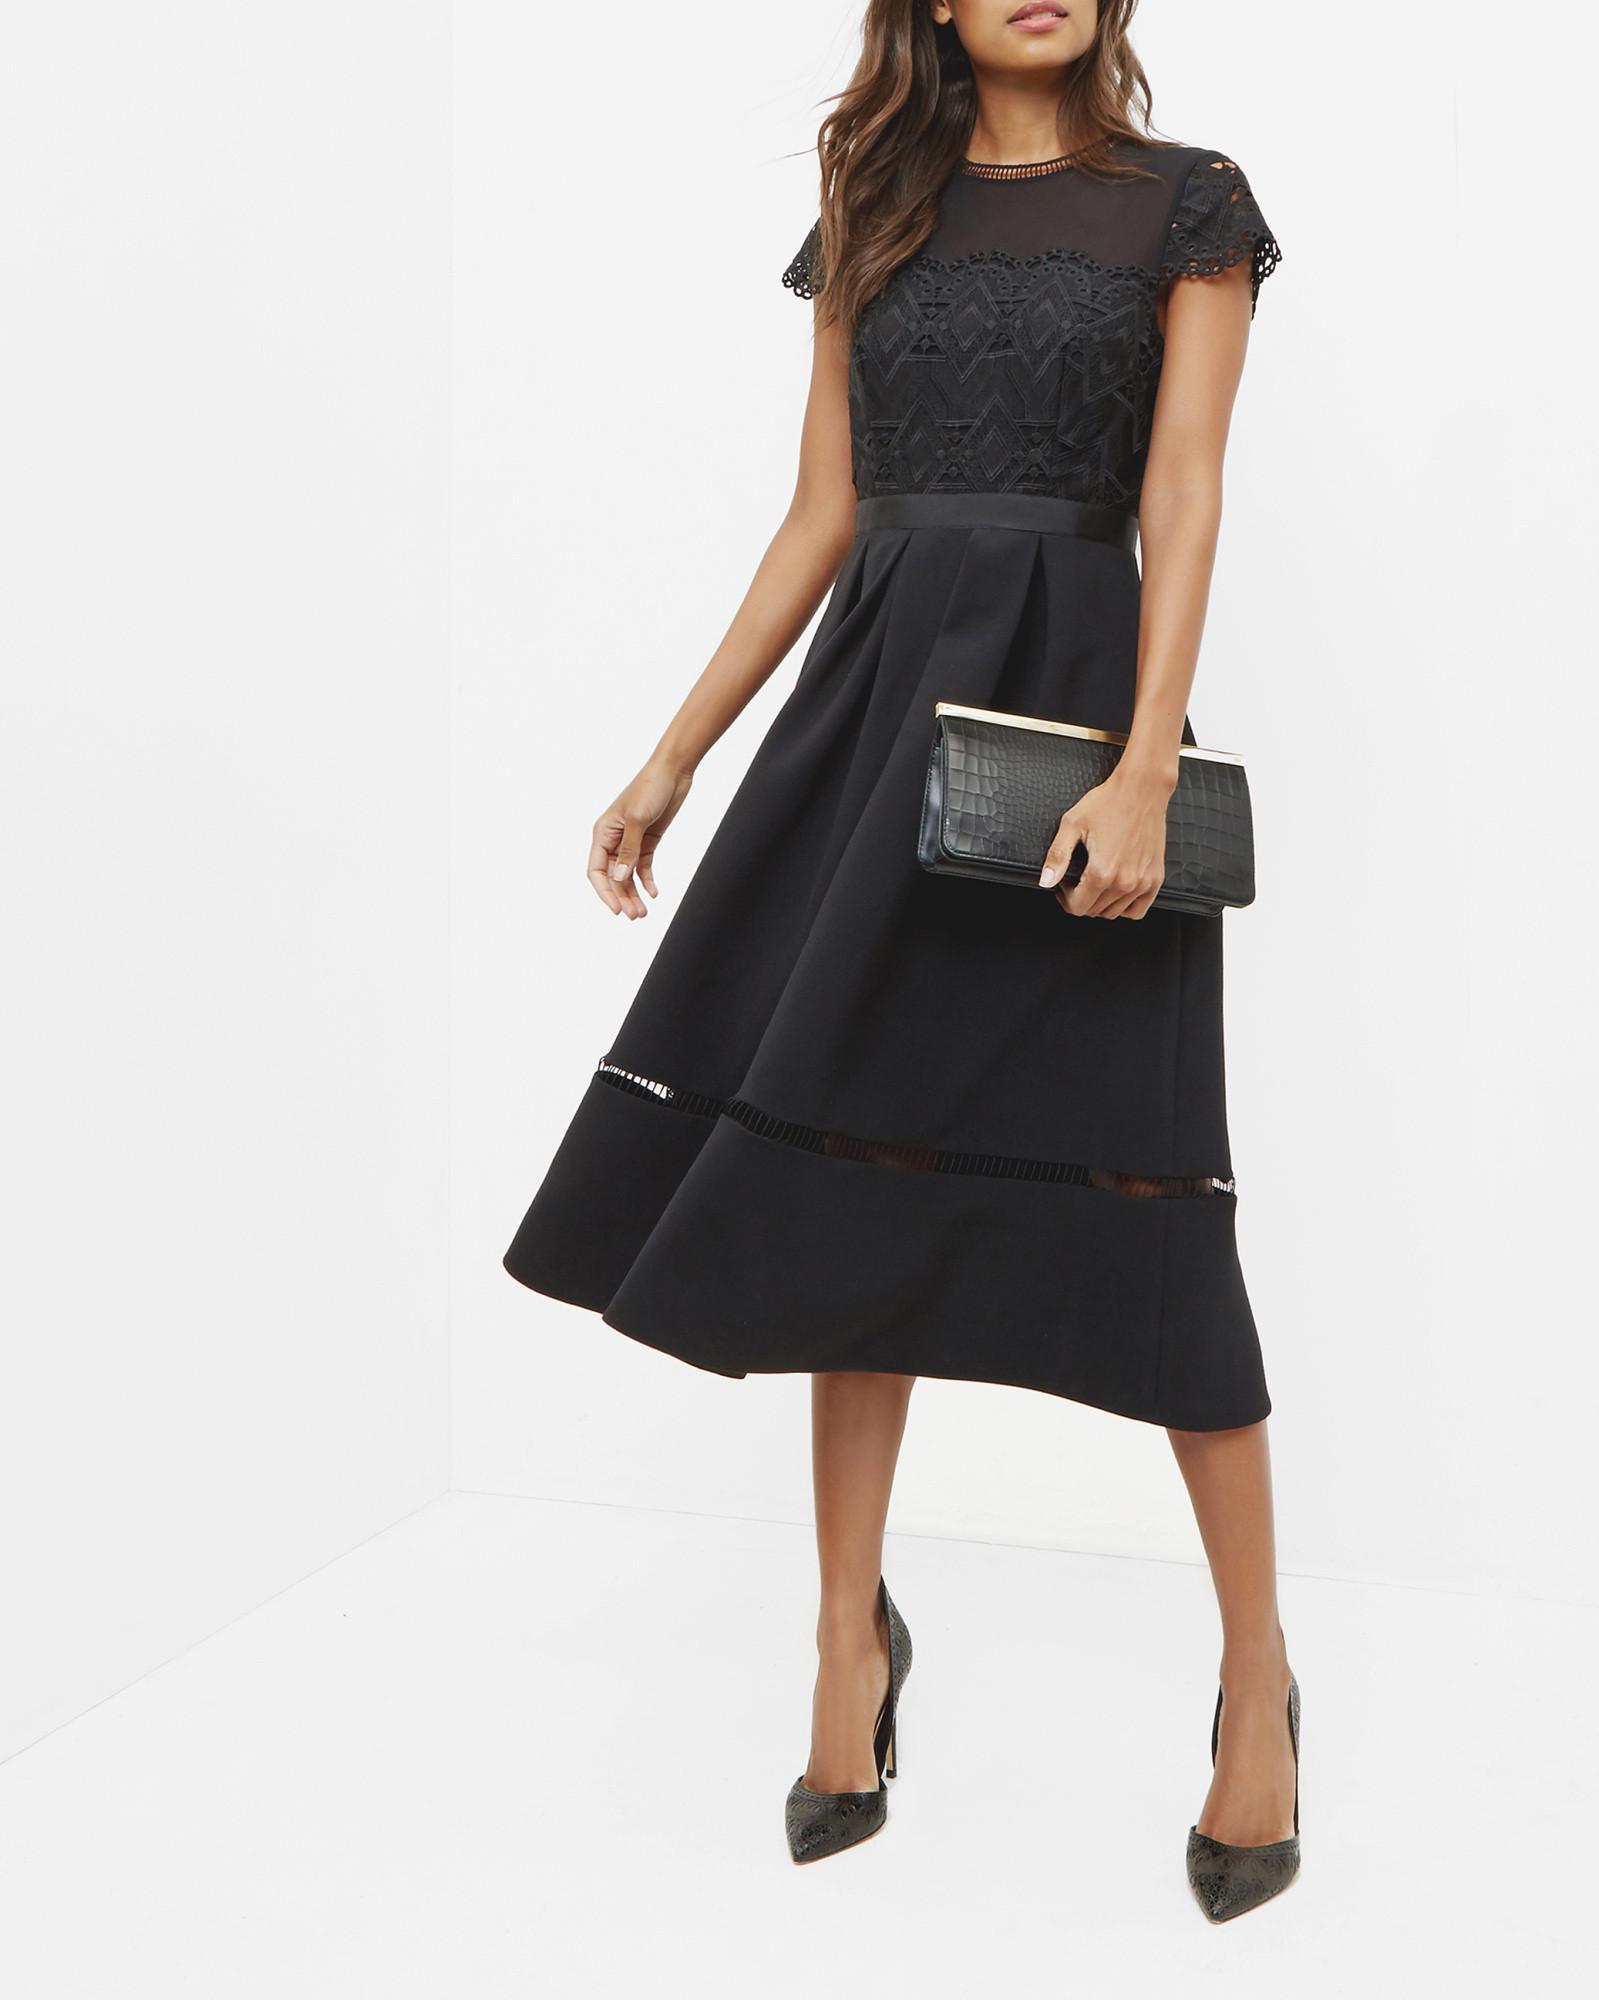 f187a9a2b2da Ted Baker Frizay Lace Bodice Full Midi Dress in Black - Lyst